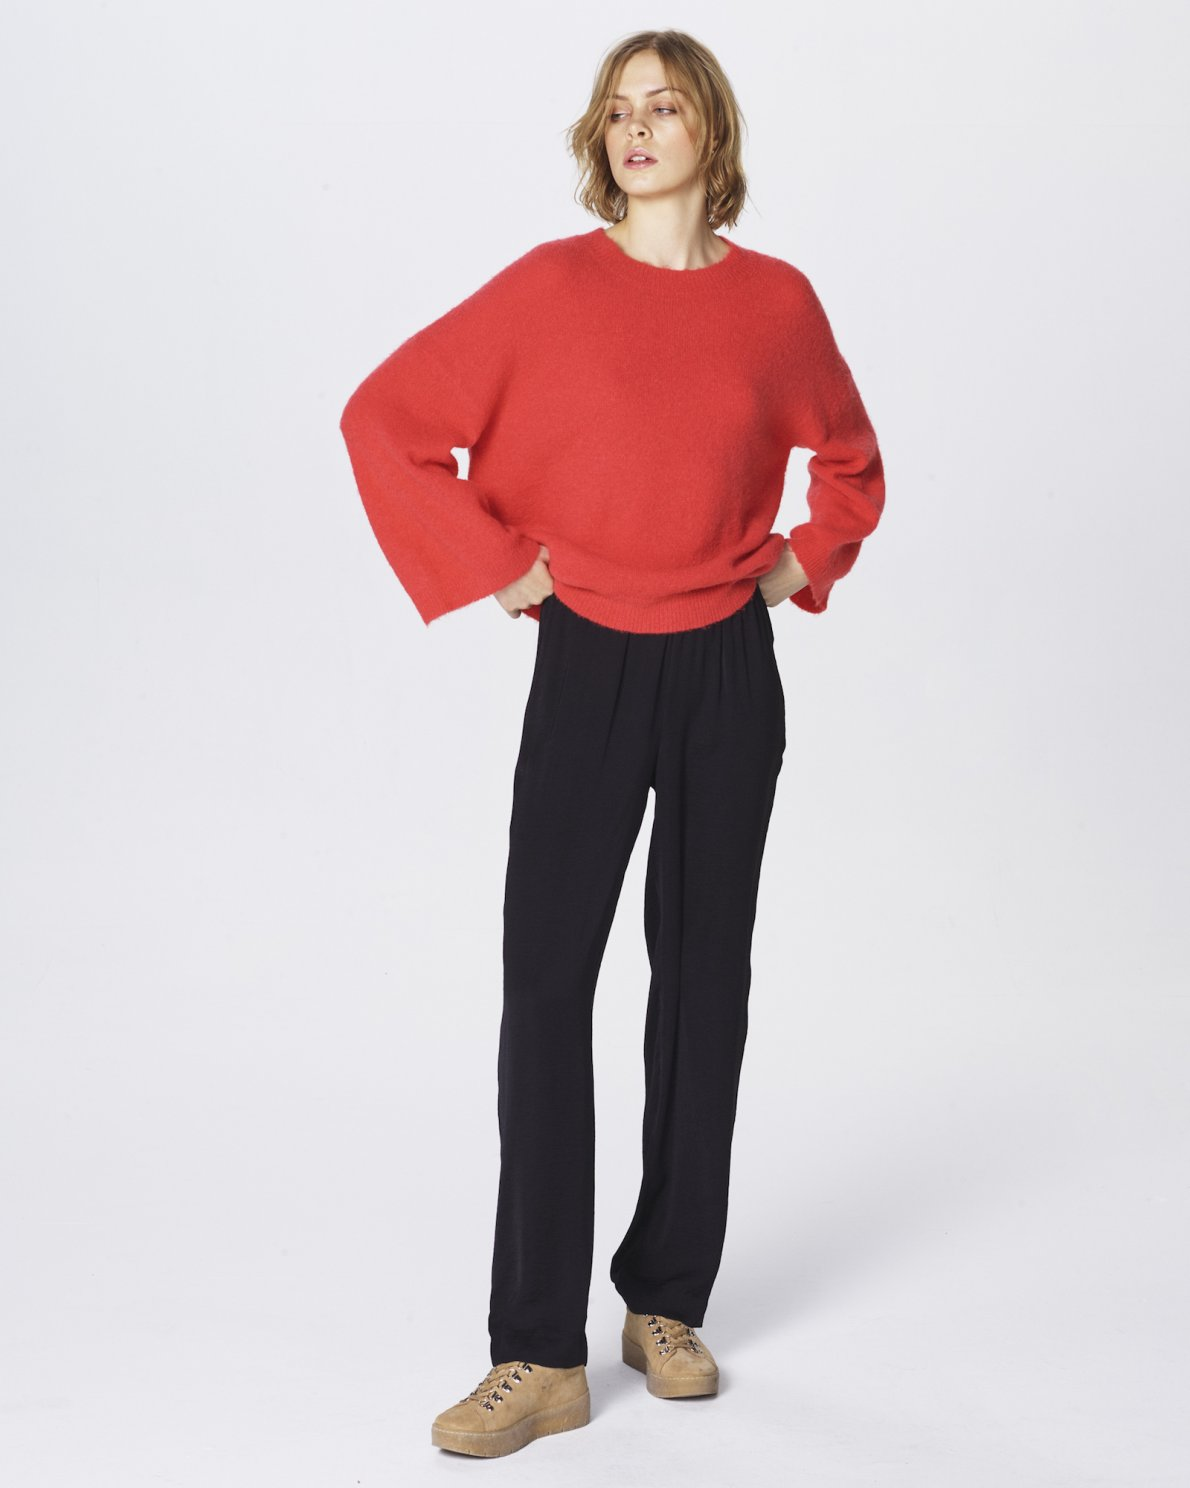 Pullover Melrose Knitwear Copenhagen Mohair Moss NX80PZnOkw